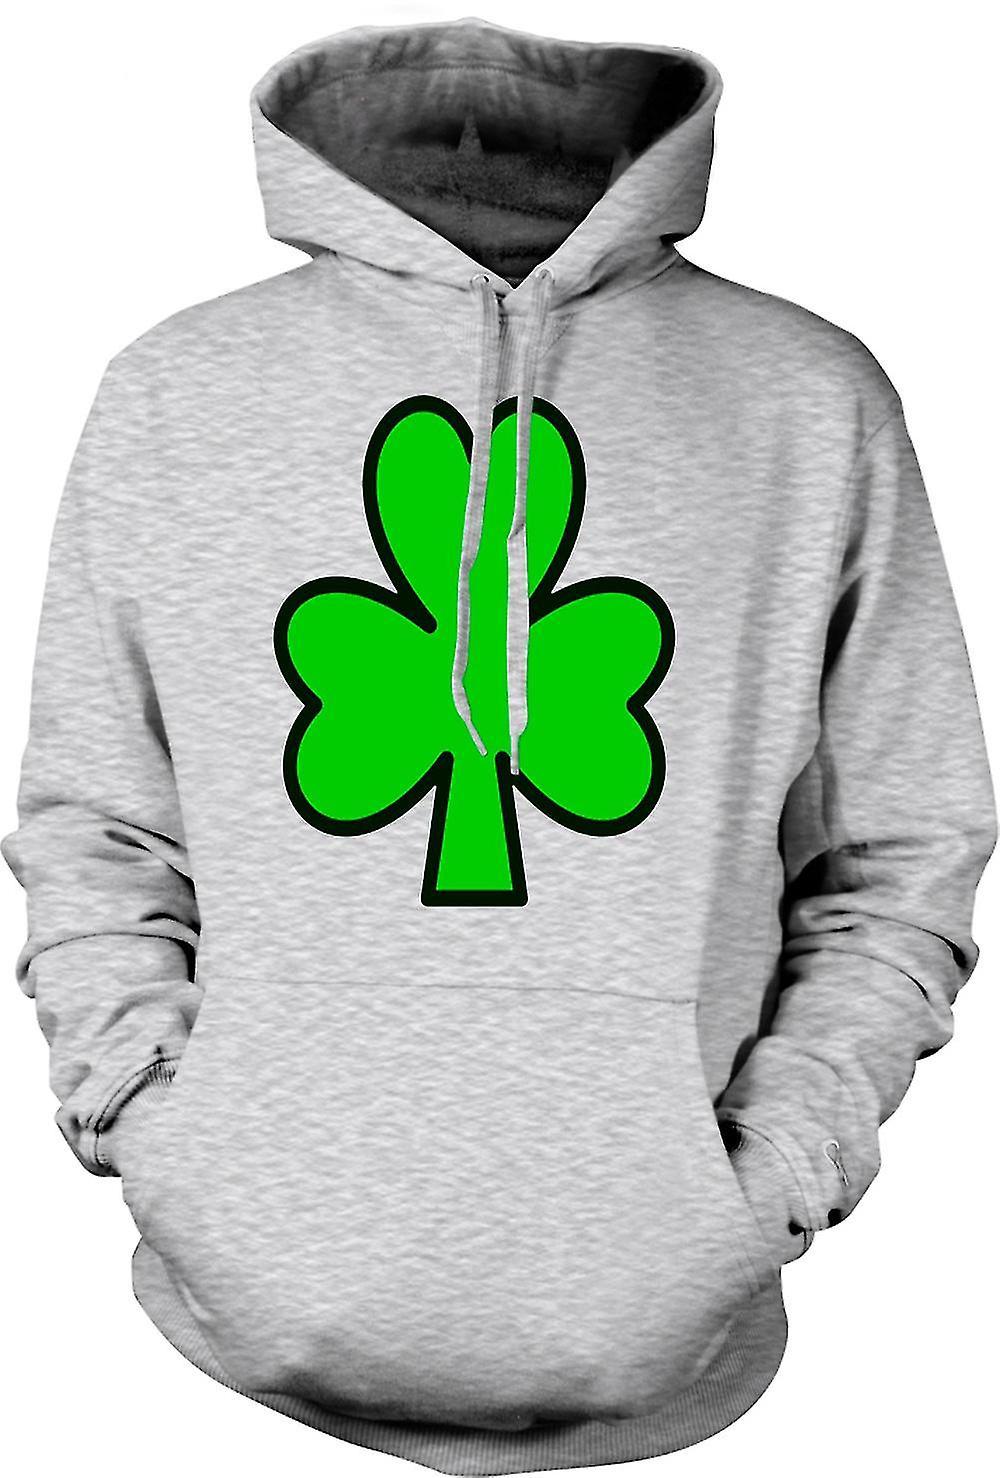 Mens Hoodie - trèfle irlandais - Funny